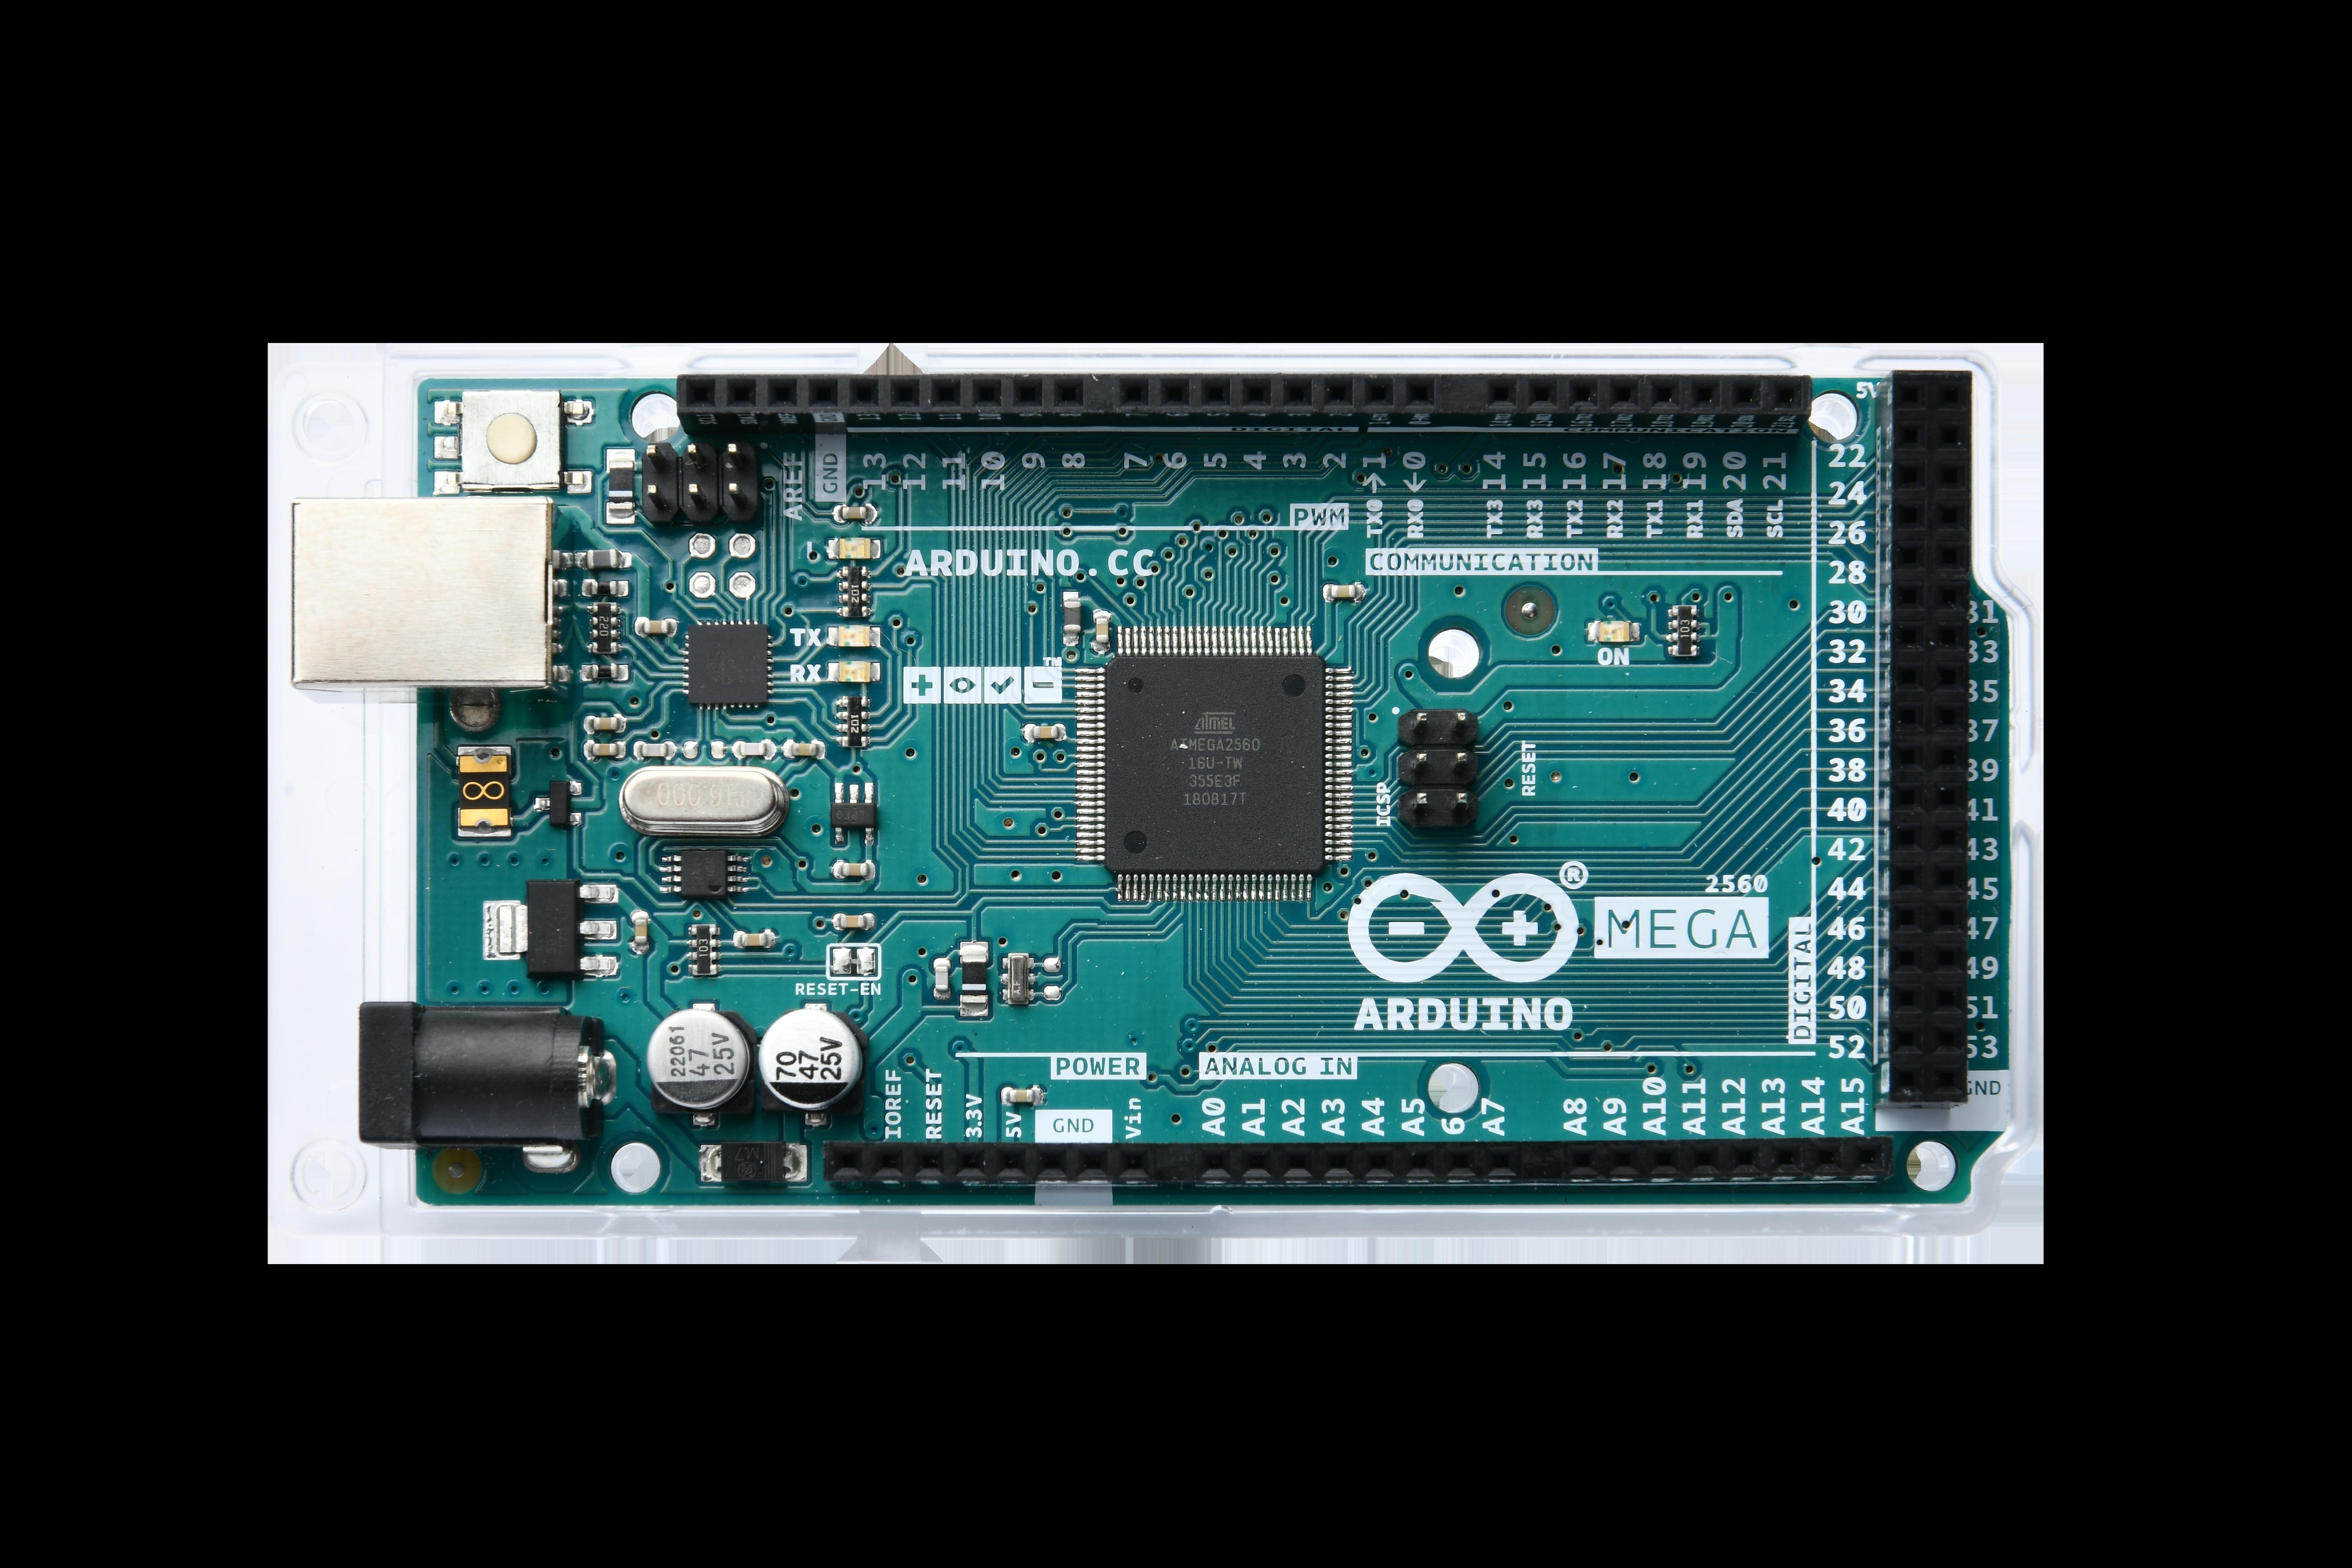 Arduino(アルドゥイーノ)Mega